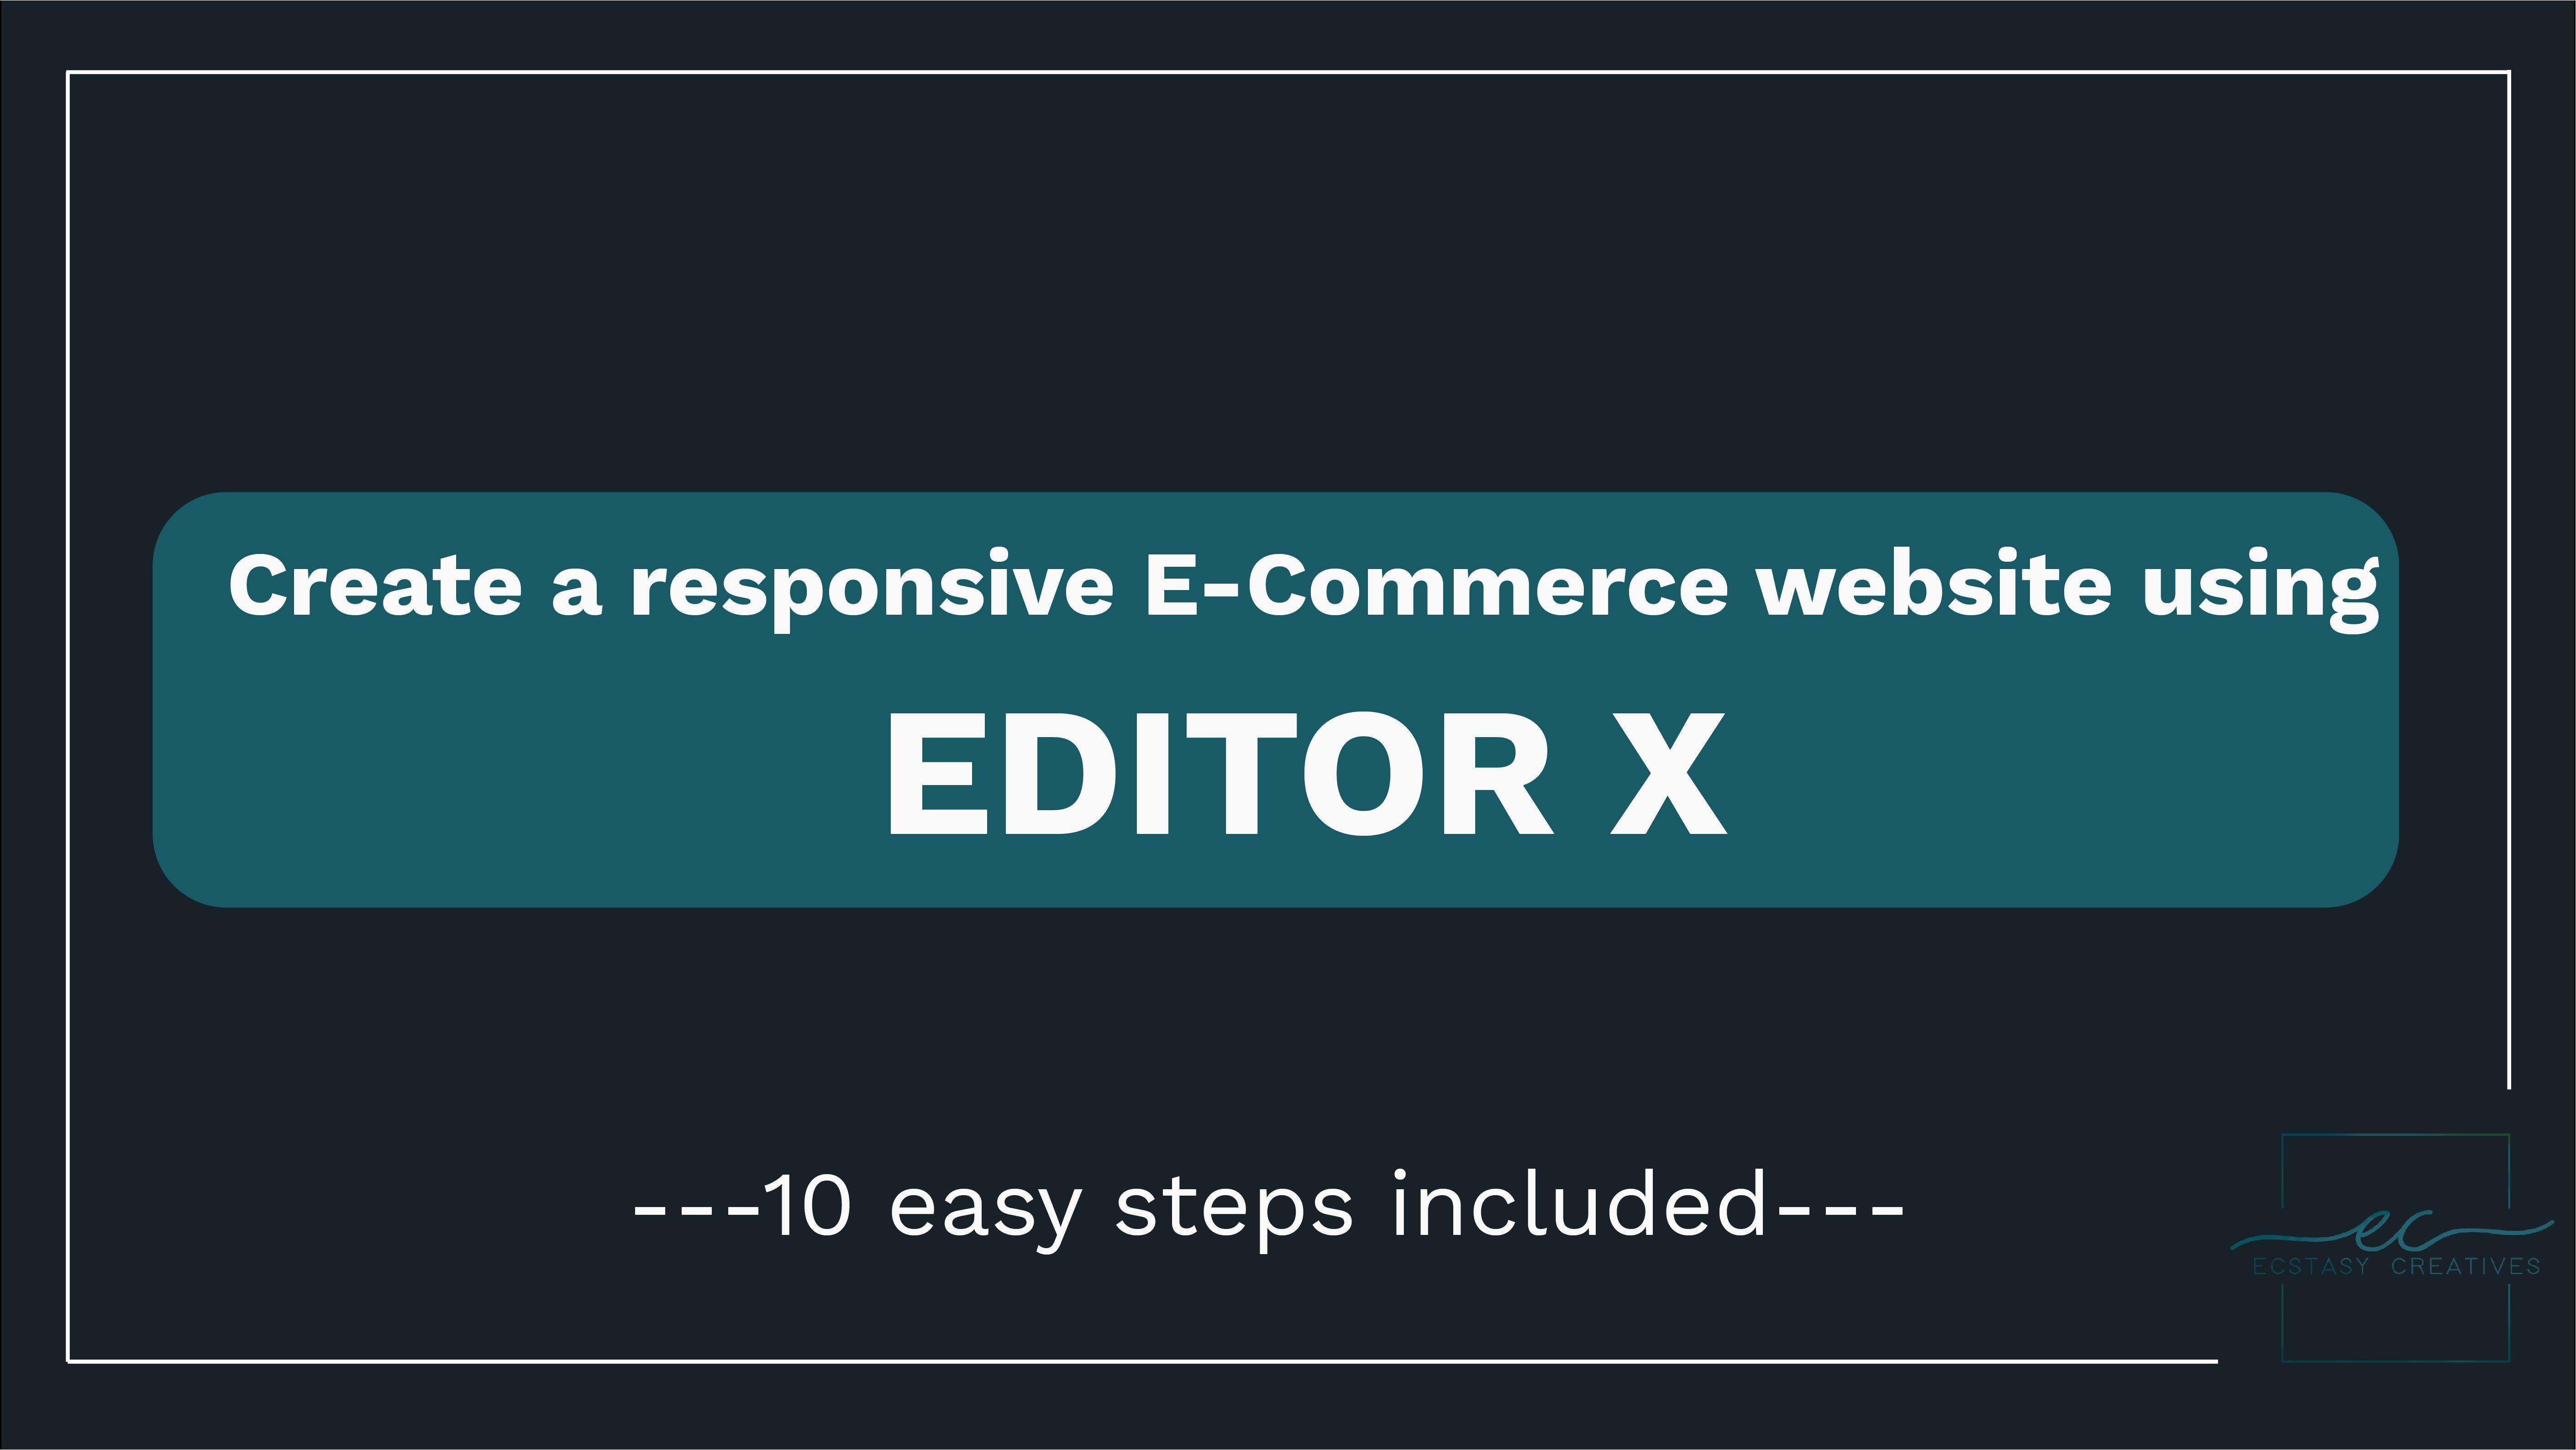 Create a responsive e-commerce website easily using editorX